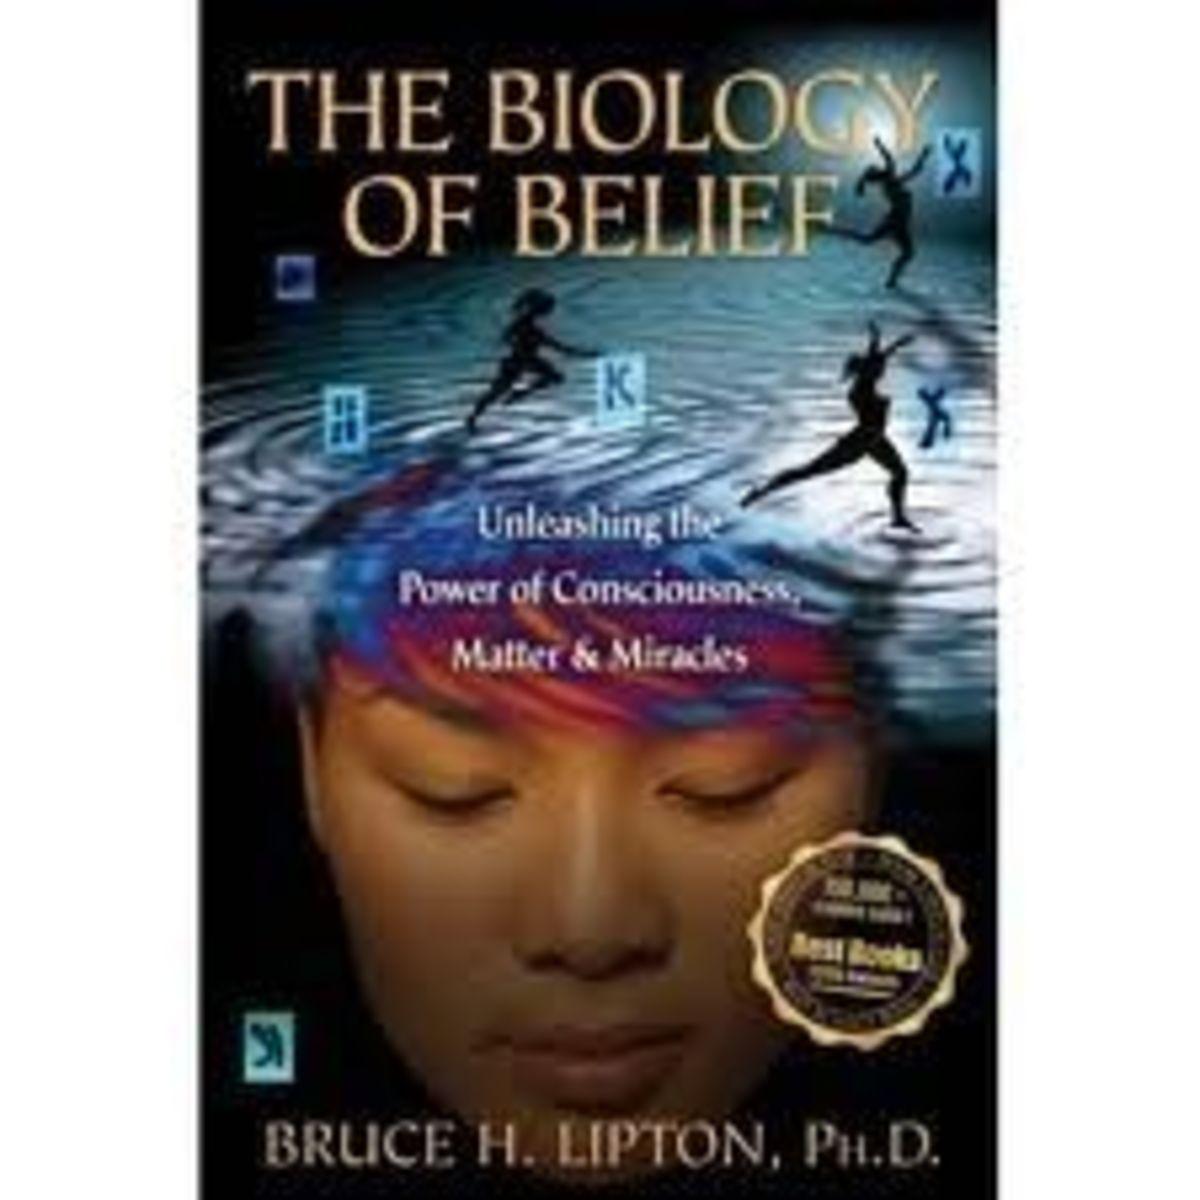 bruce-lipton-biology-of-belief-2